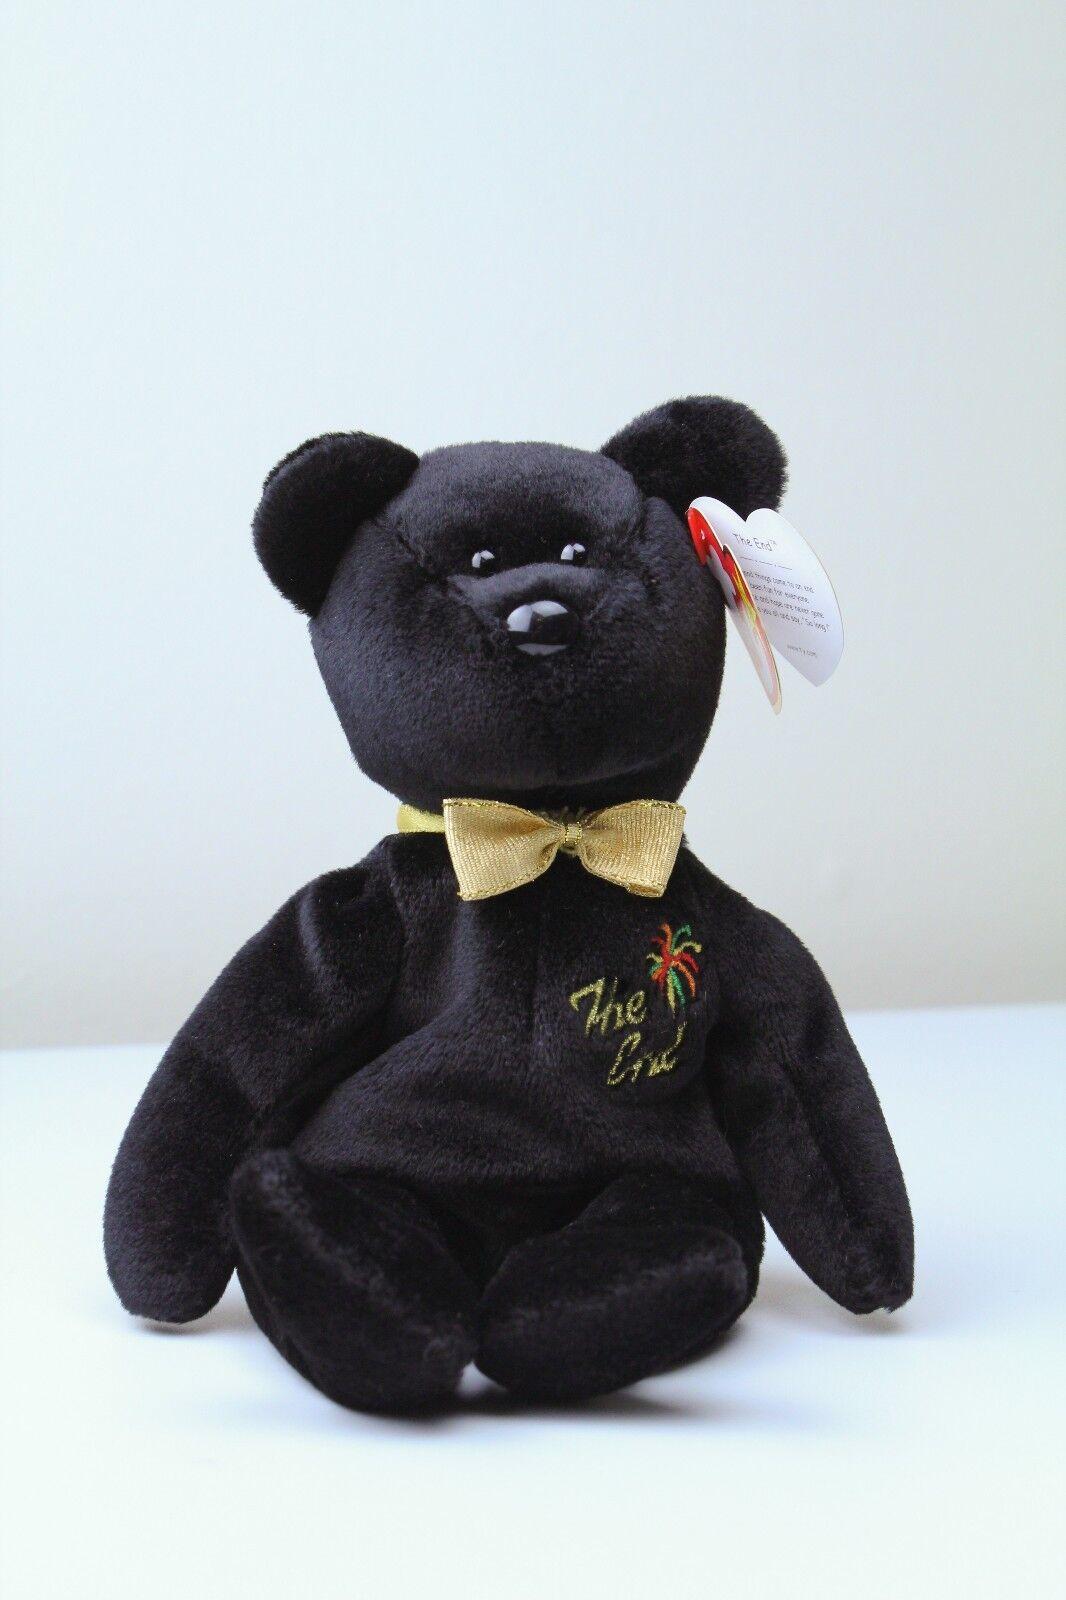 Beanie Babies  The End  Bear With Flat Tush Tag & Errors - Rare